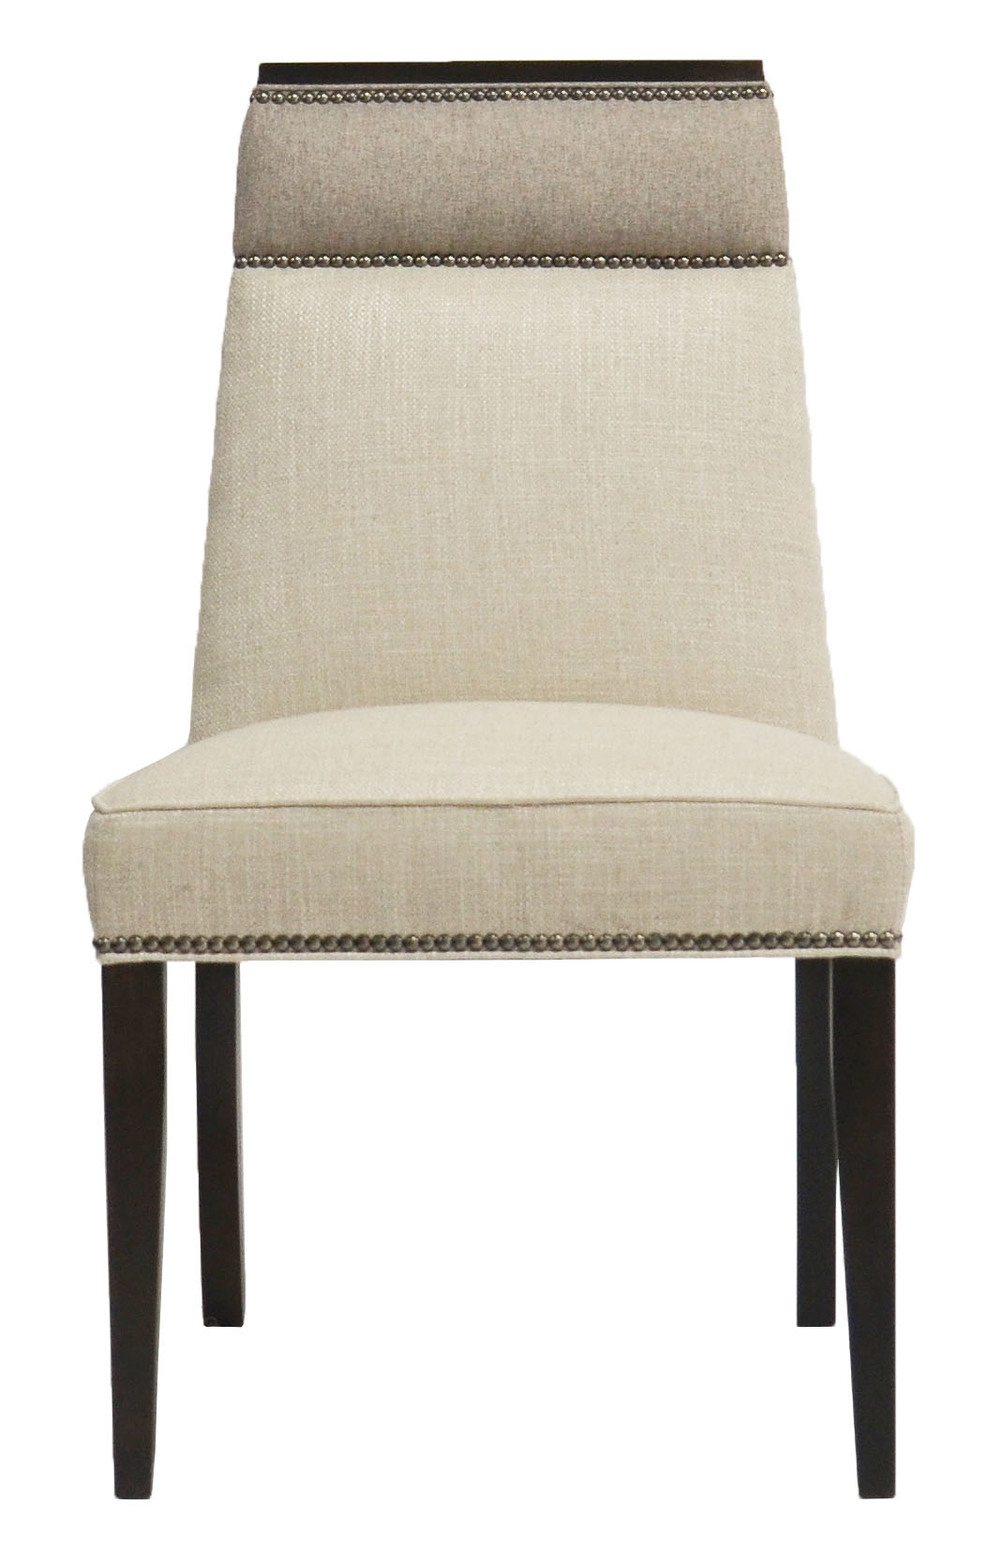 Vanguard Furniture - Phelps Side Chair